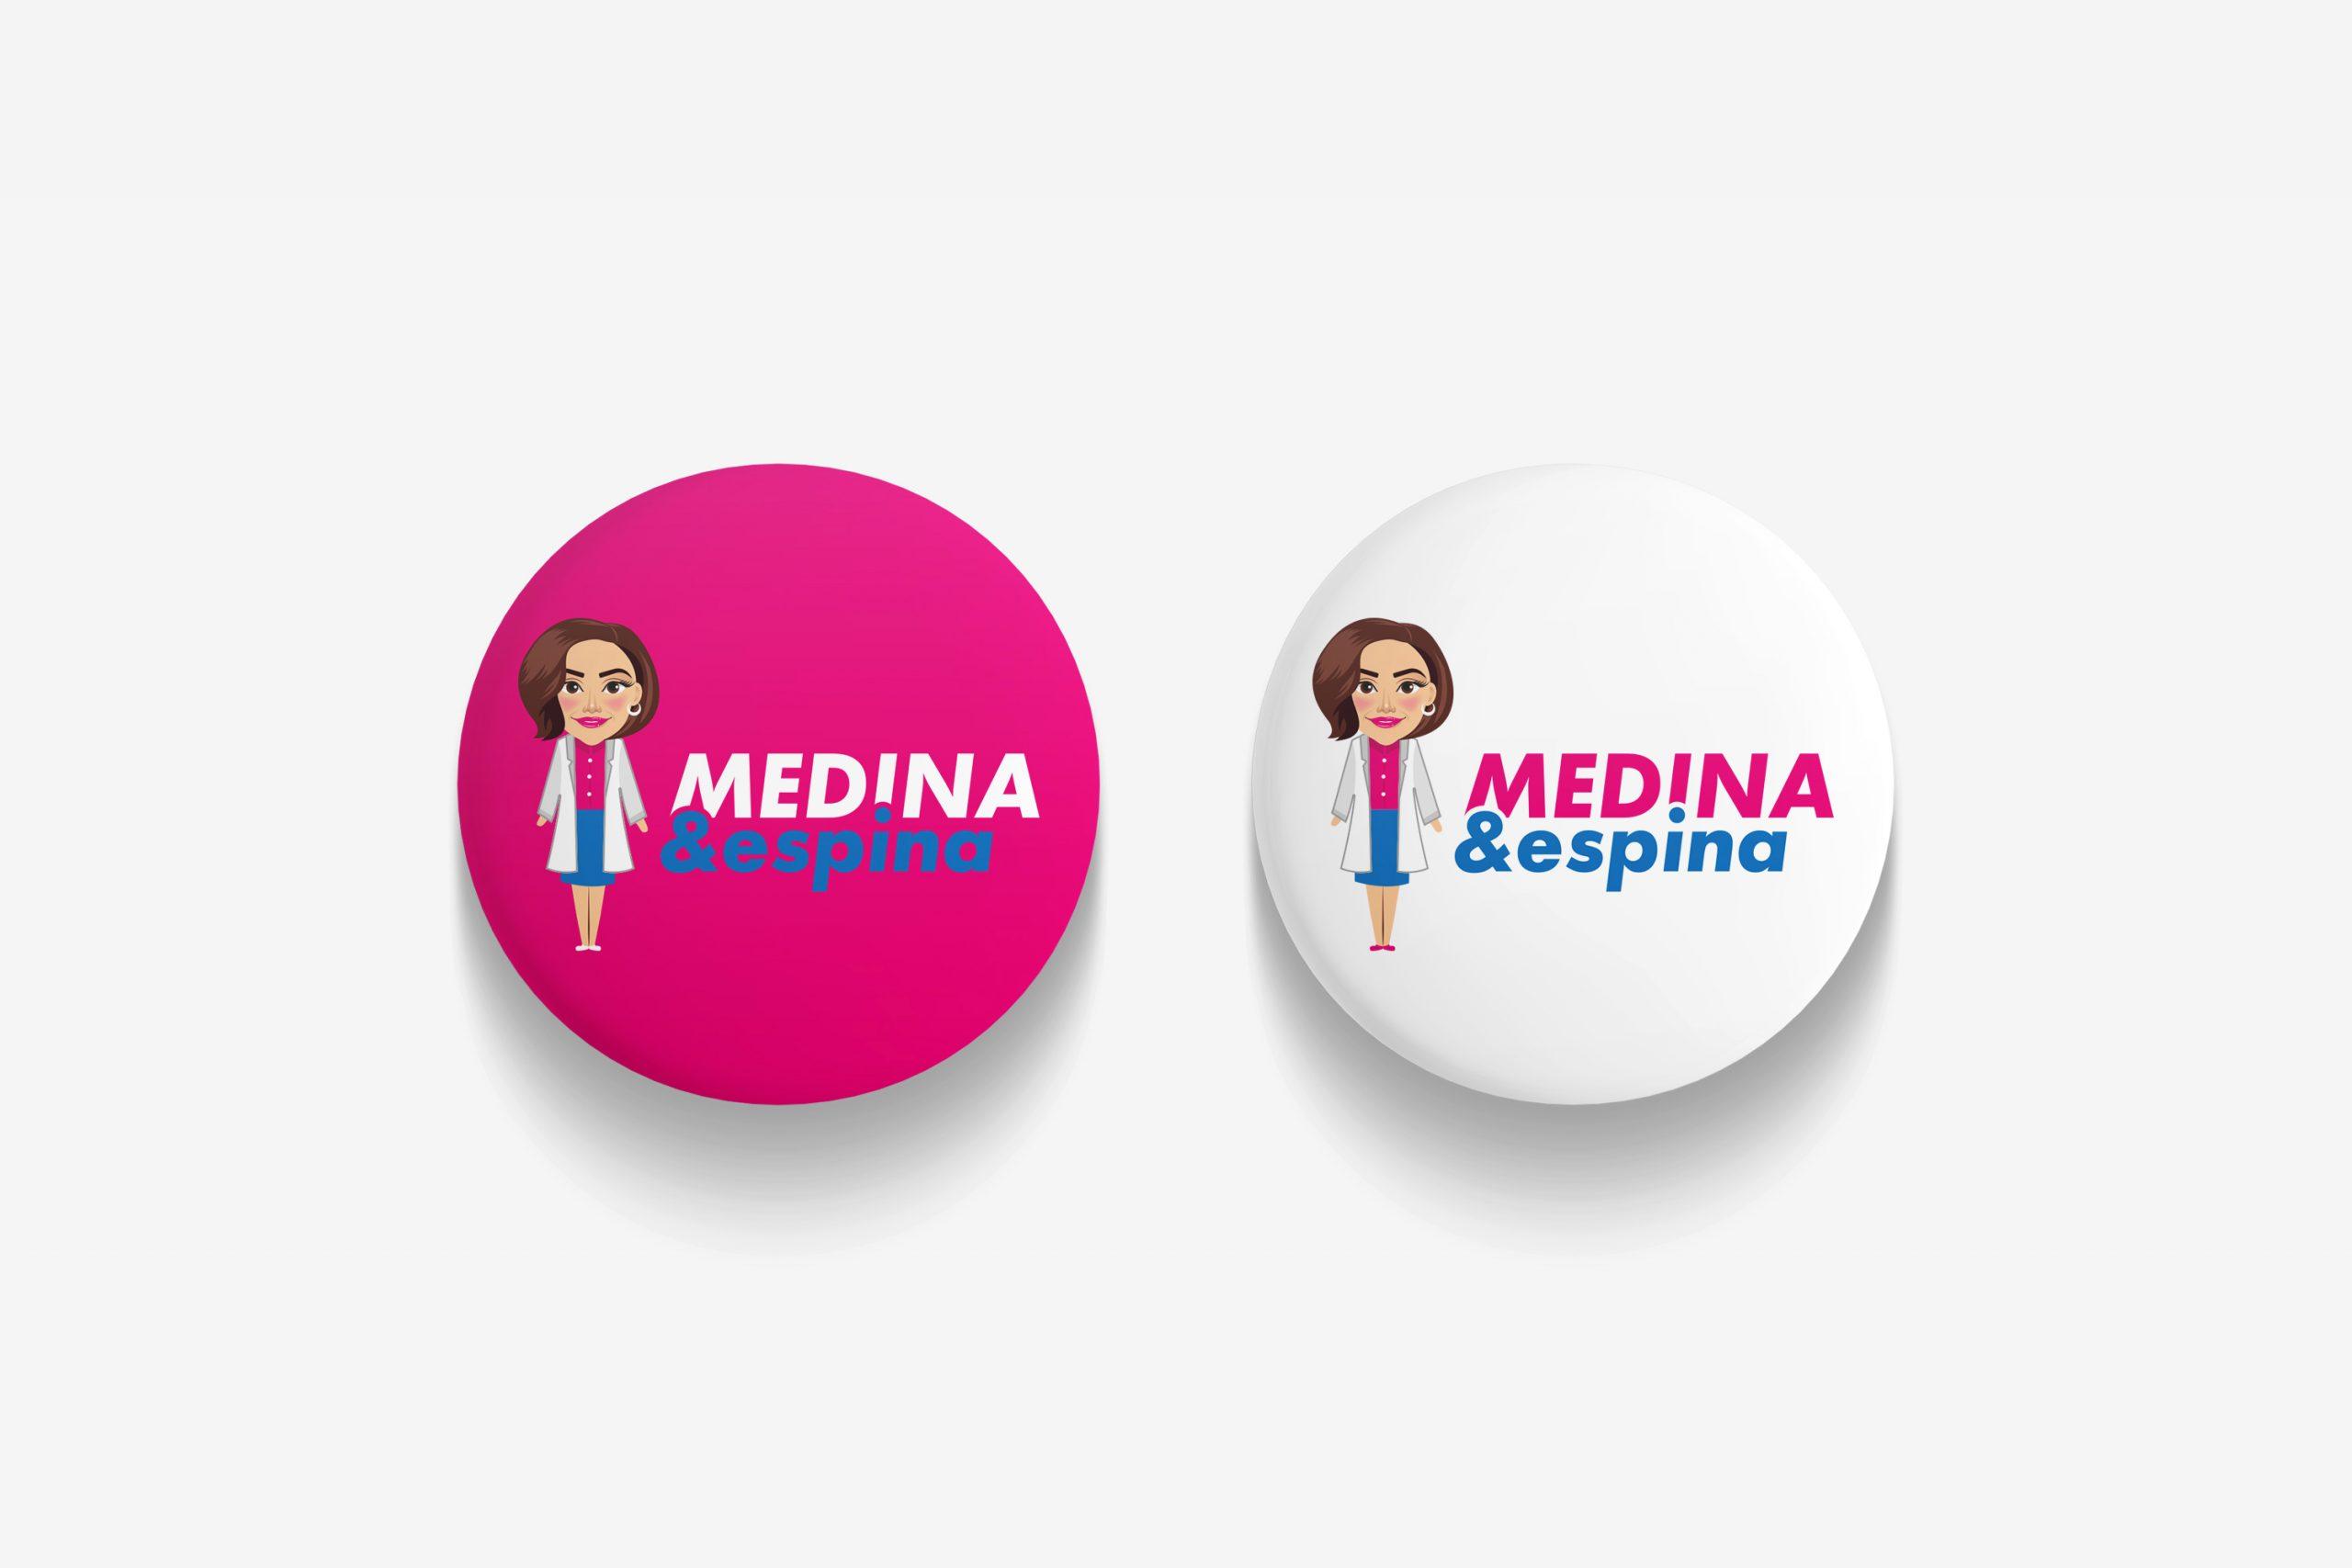 Medina Espina разработка полиграфии